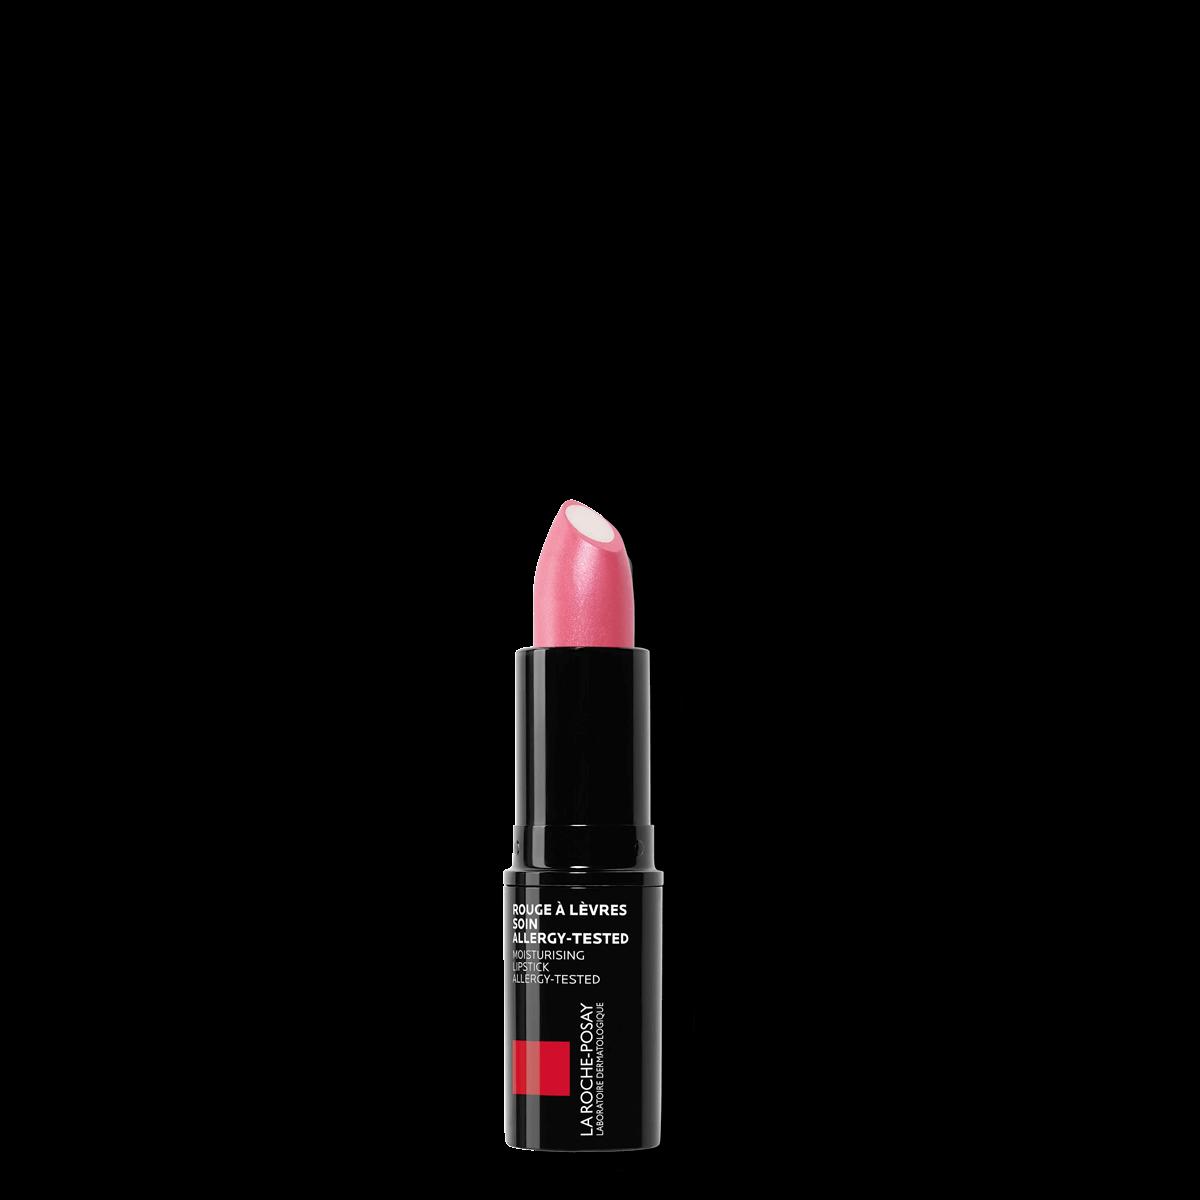 La Roche Posay Sensitiv Toleriane Makeup NOVALIP 05 RosaFersken 3009263